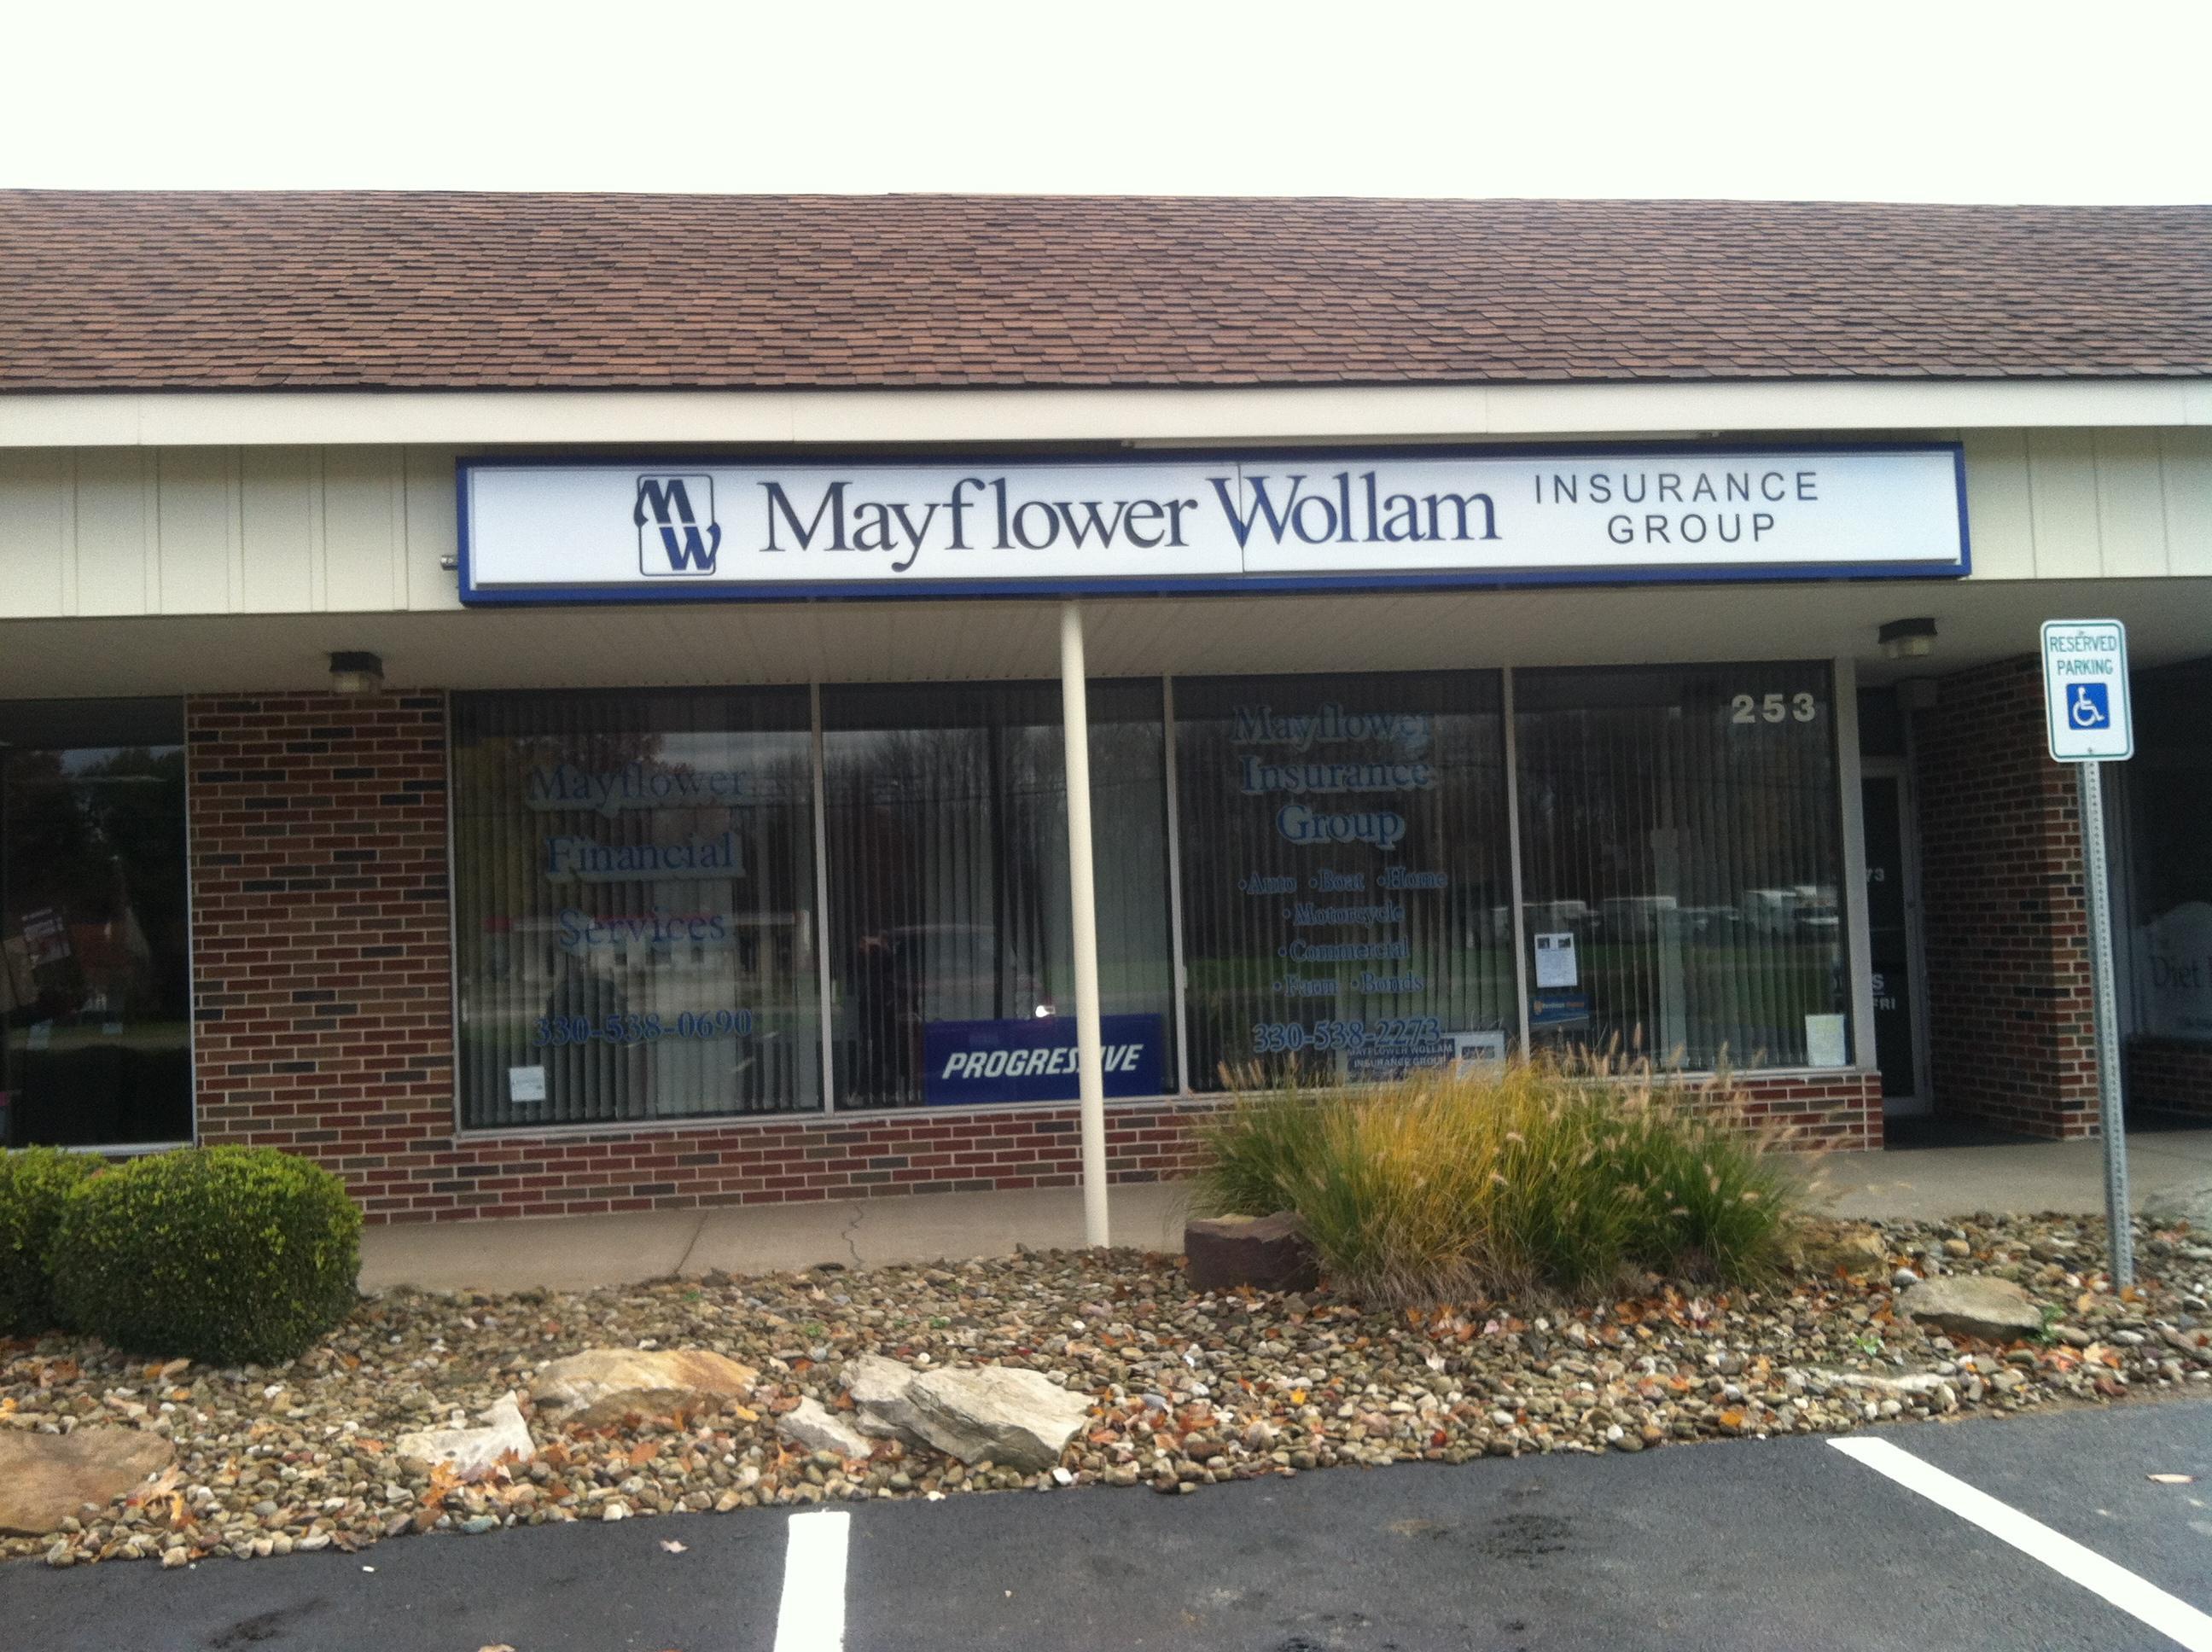 Mayflower Wollam Insurance Group